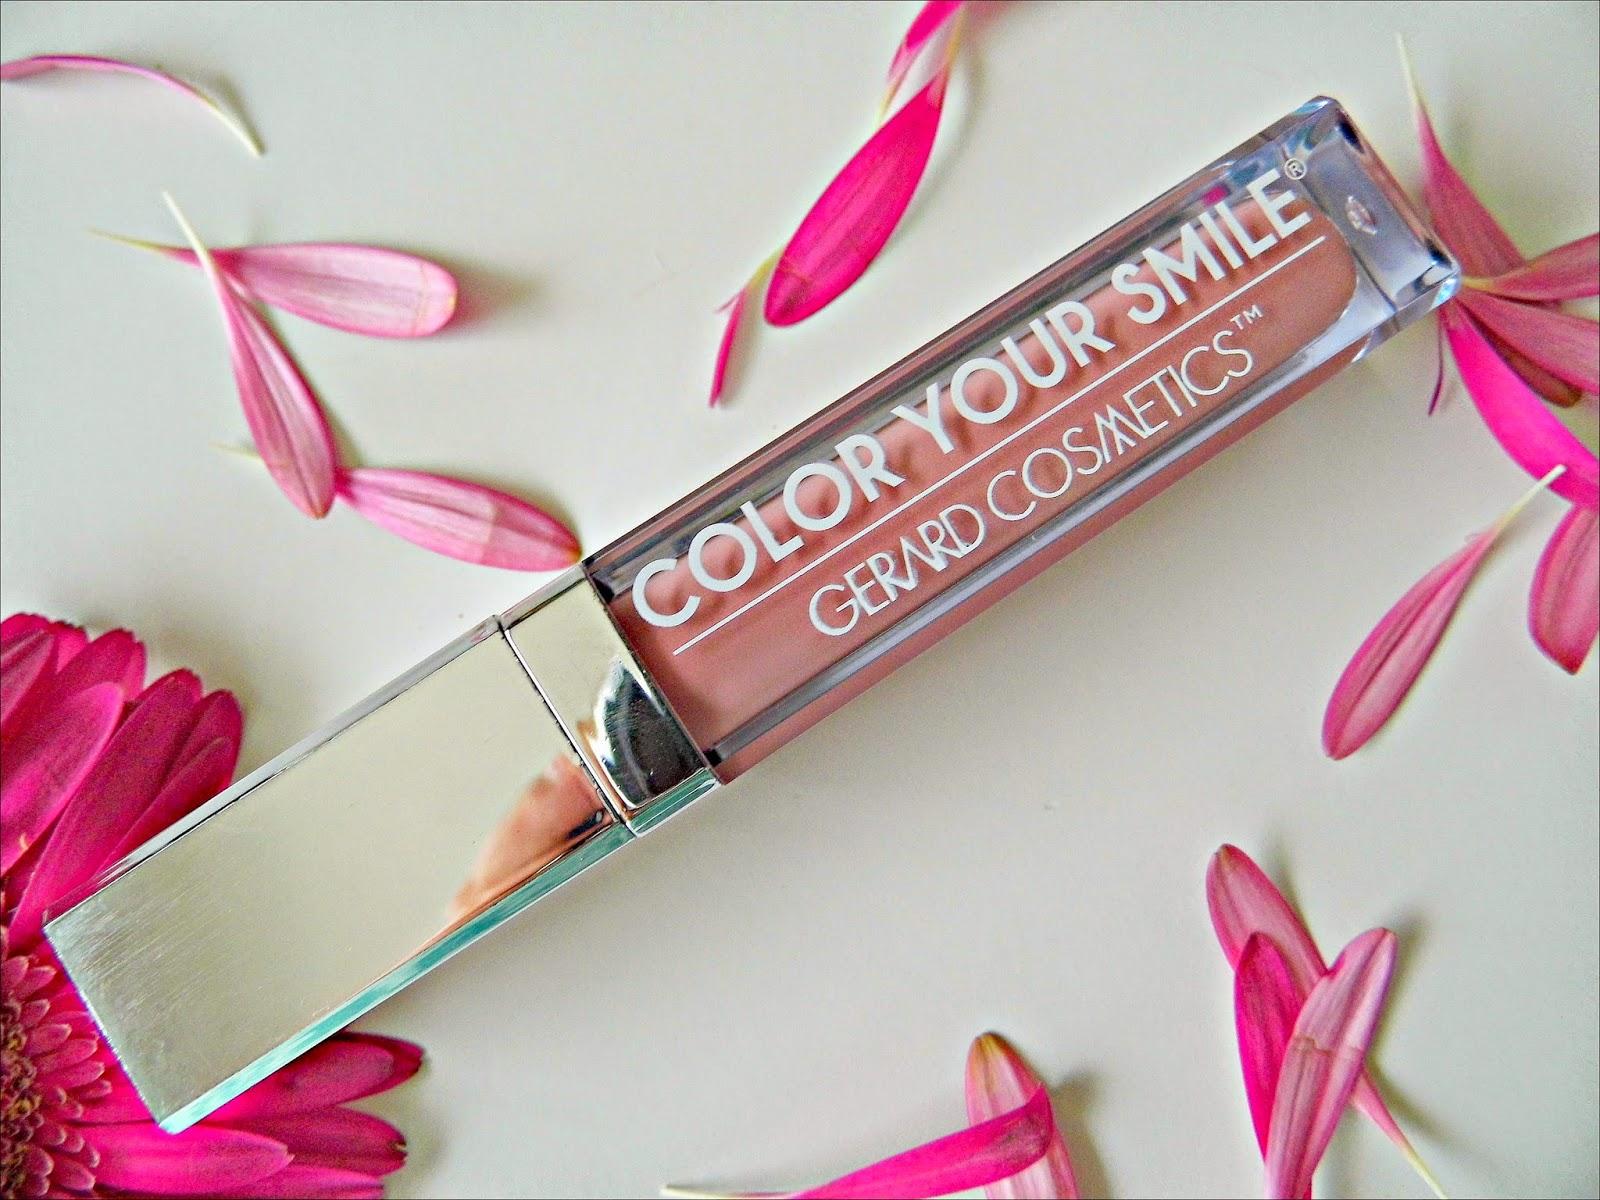 Whitening Lightning Color Your Smile Lighted Lip Gloss in ...